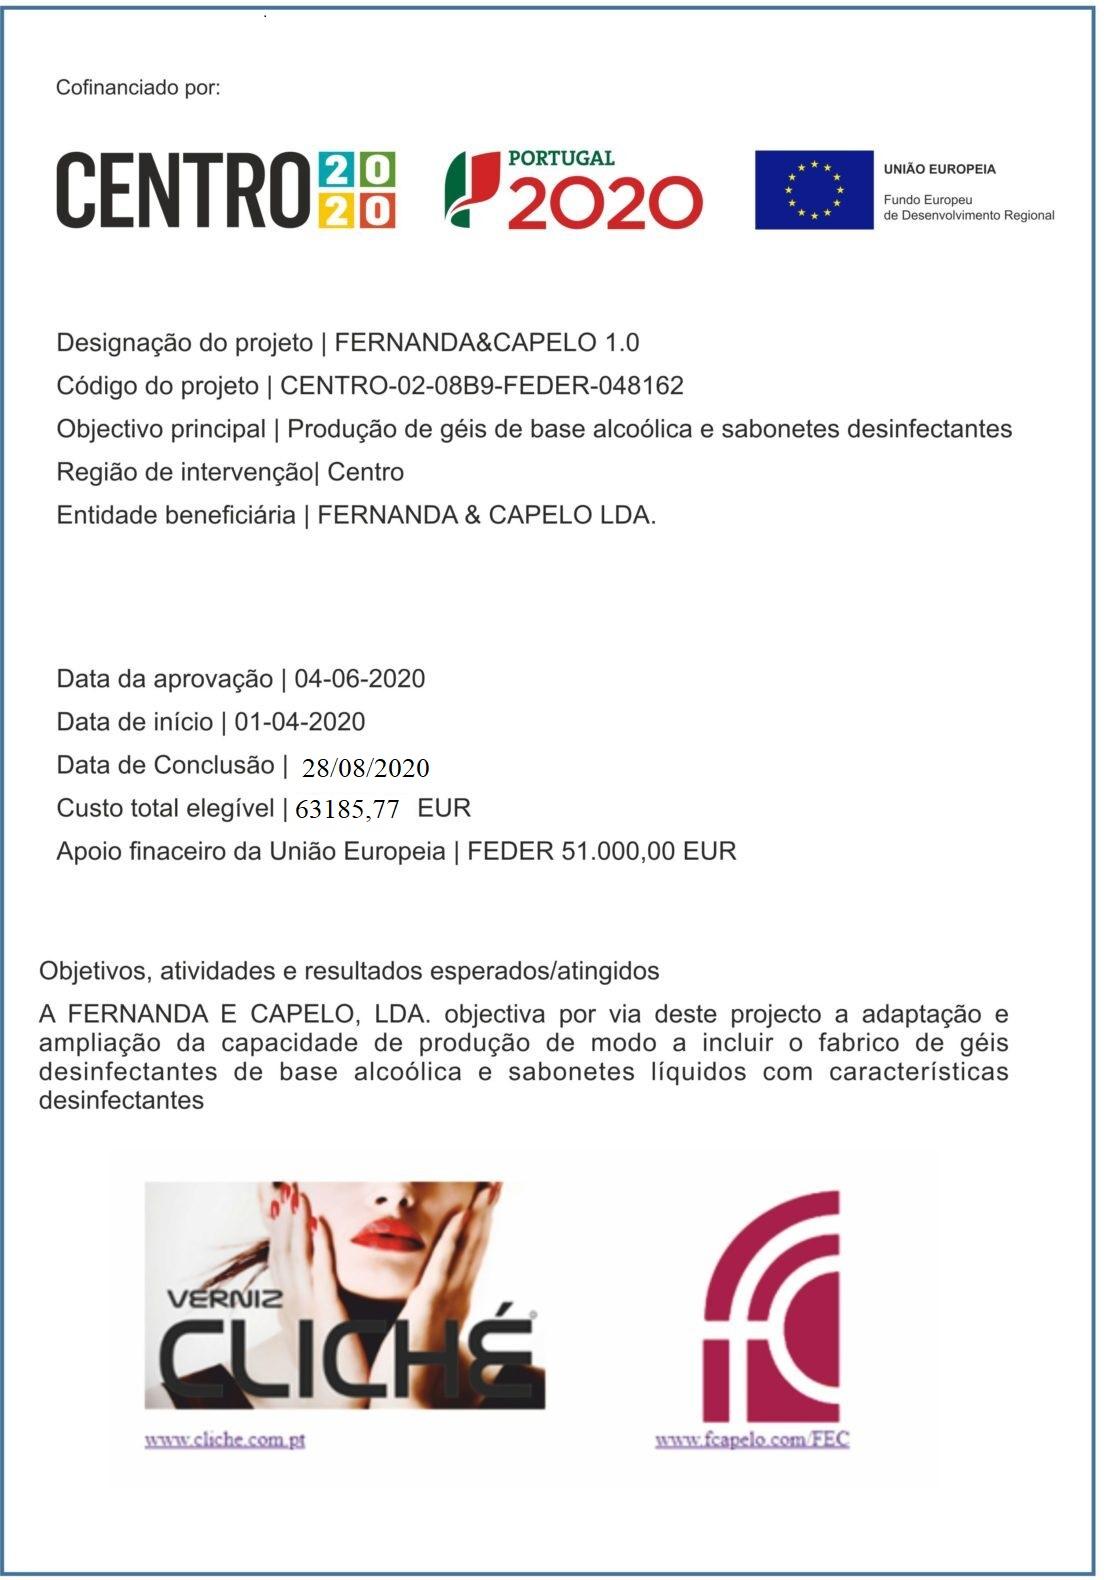 Ficha de Projeto_Fernanda&Capelo